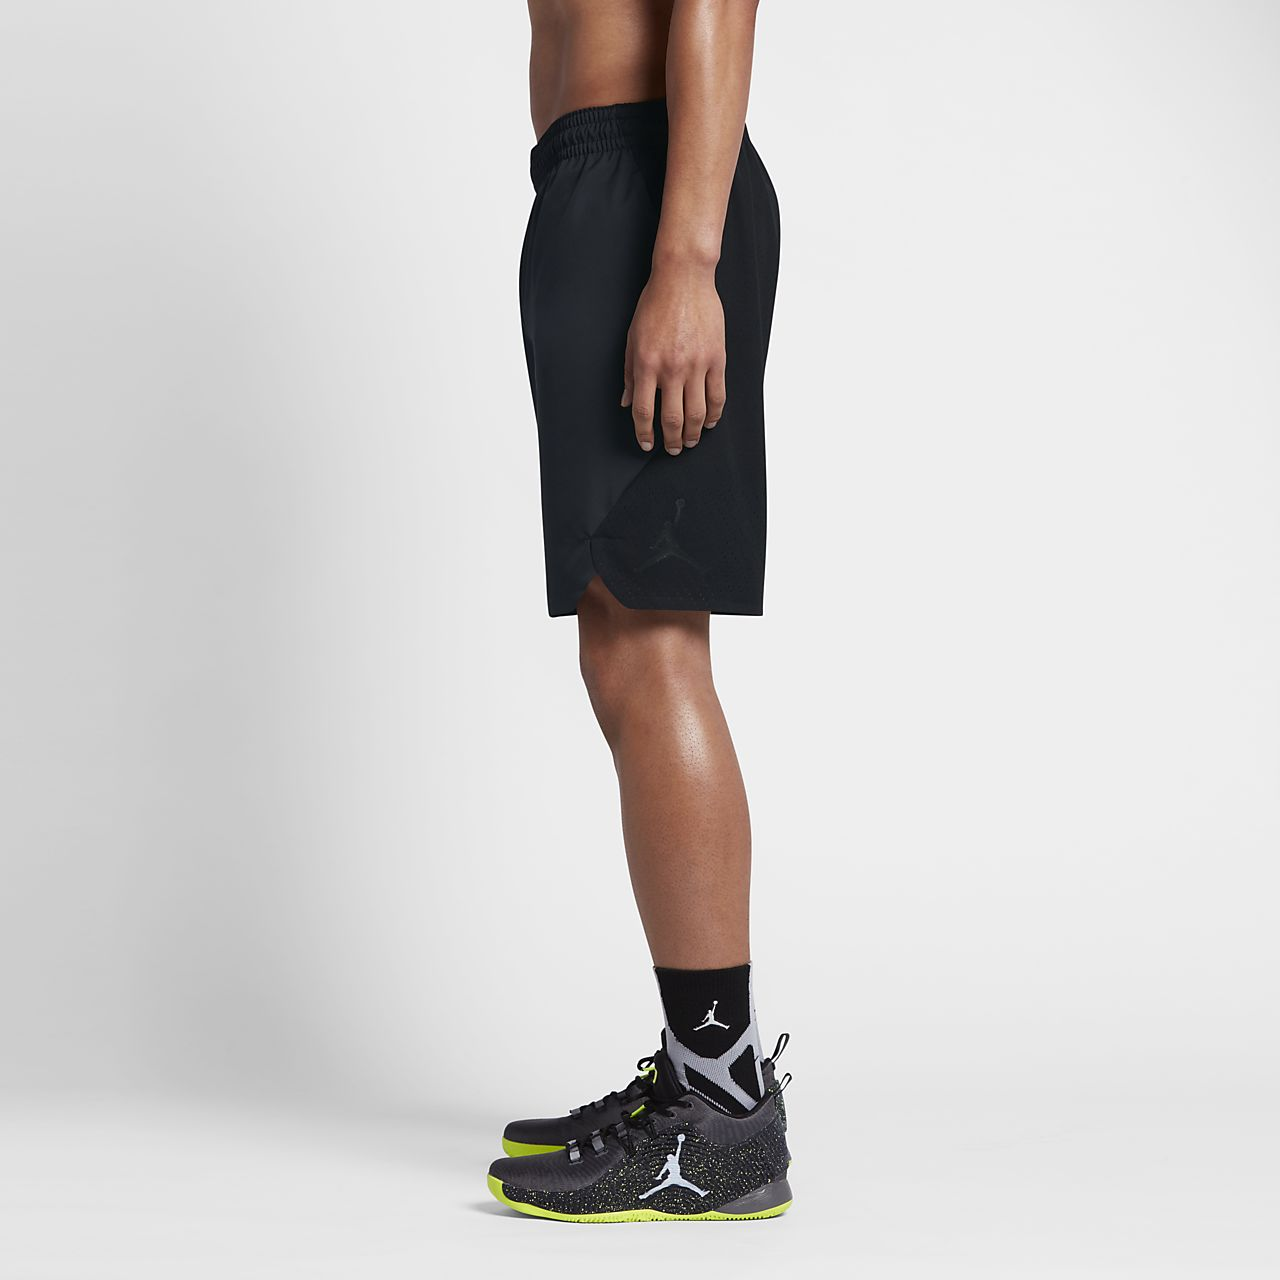 59d8fe0624db Jordan Ultimate Flight Men s Basketball Shorts. Nike.com IN